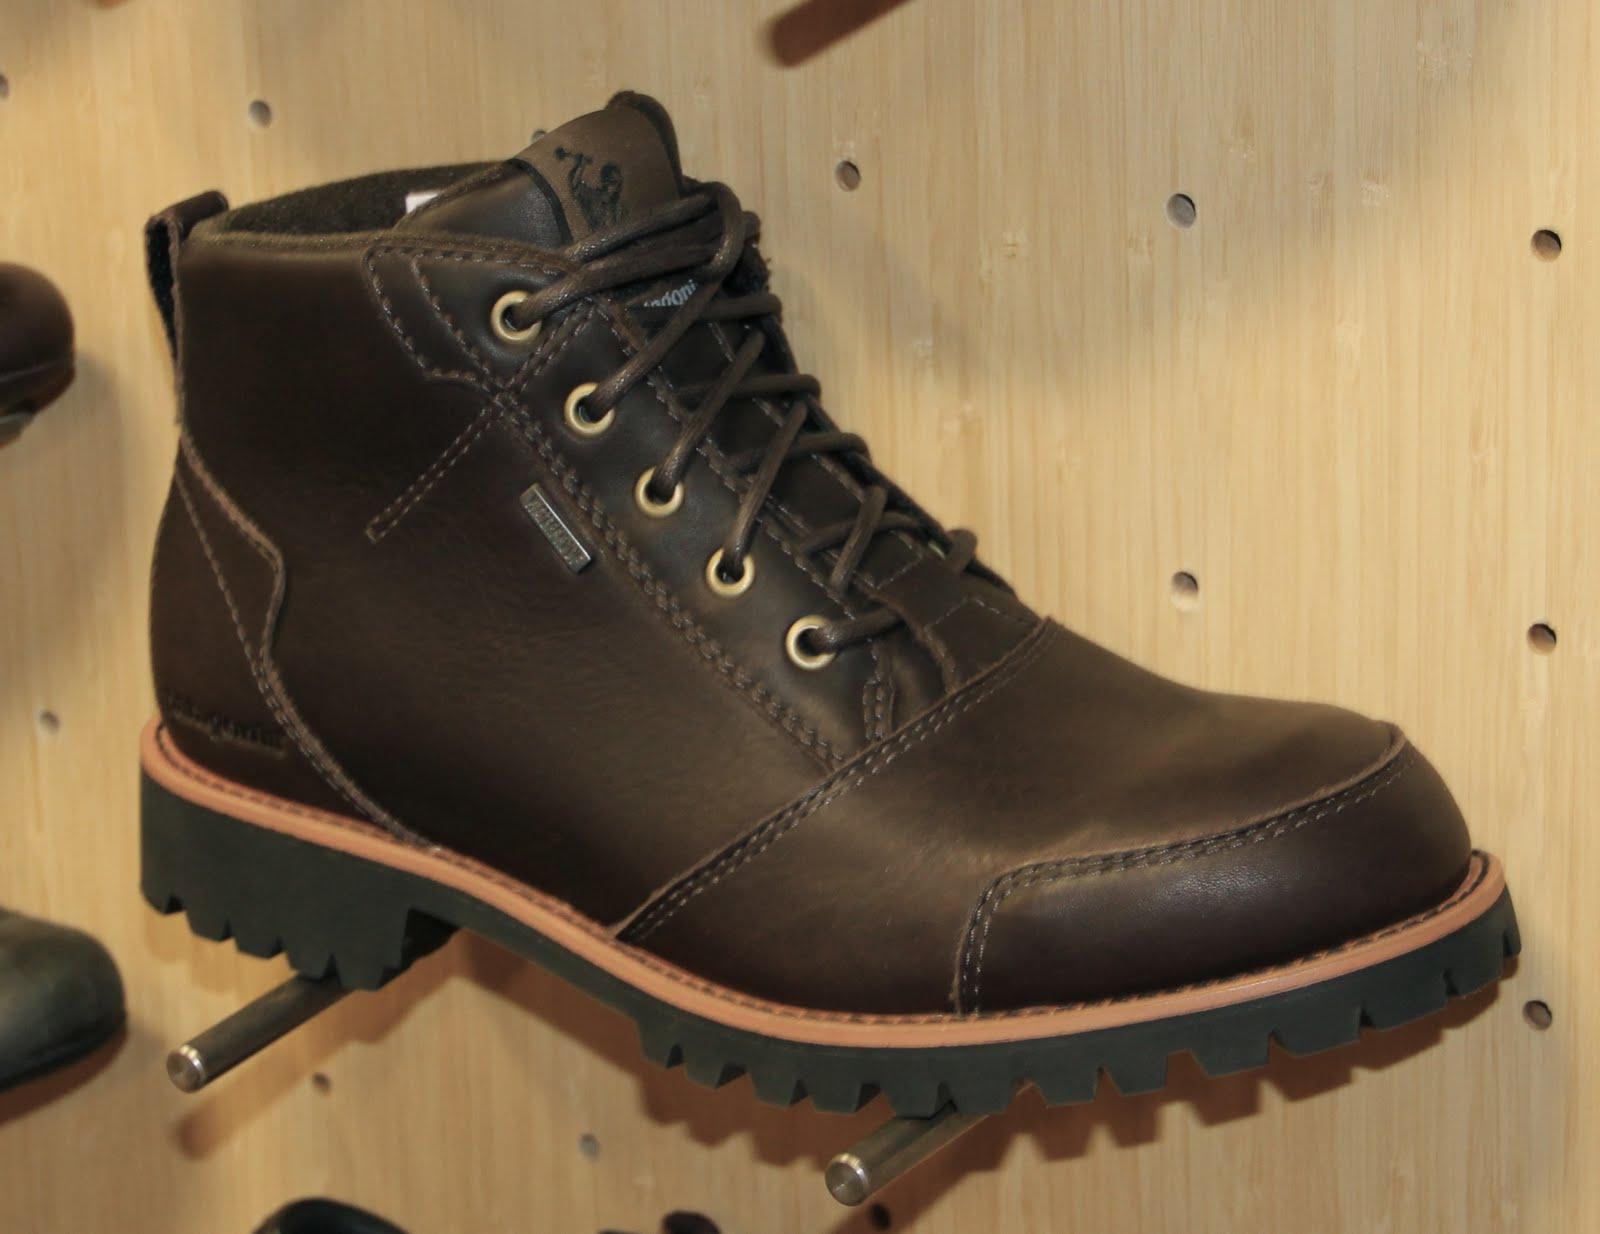 99ecadbd4f39c PATAGONIA   MERRELL Footwear Fall 2011 Media Preview